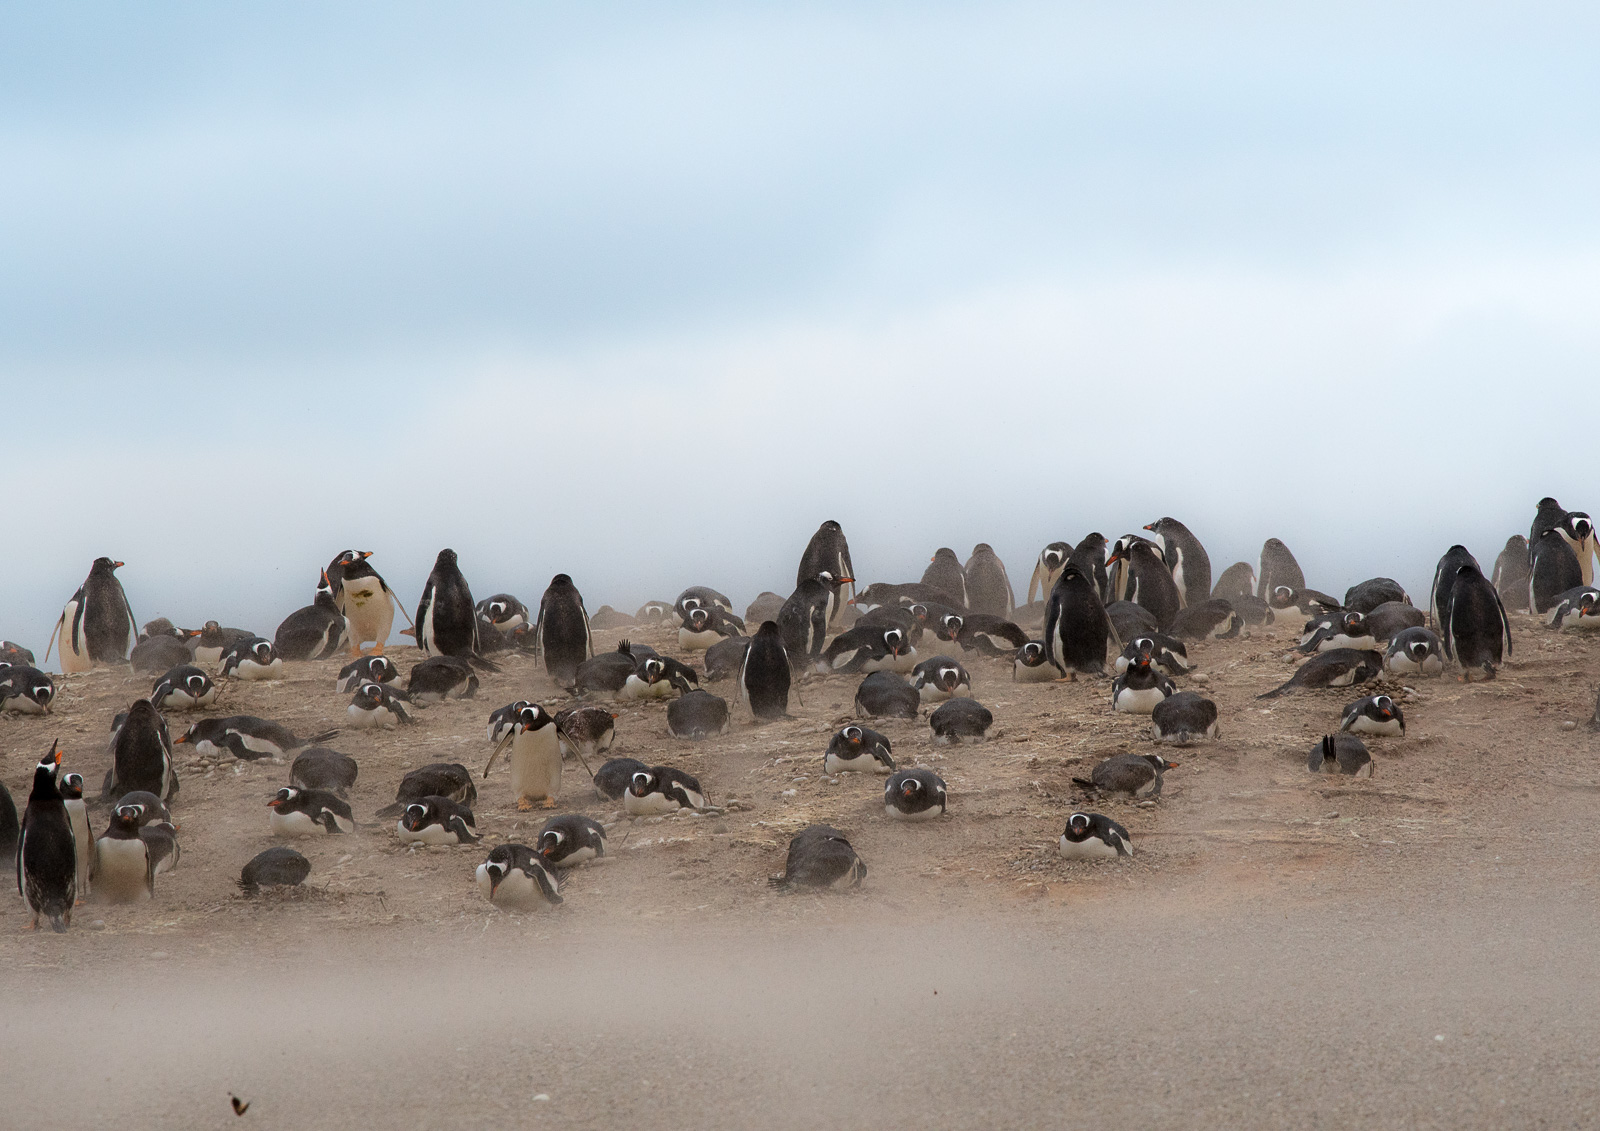 Gentoos appear unmoved by the battering sandstorm.  Nikon D500 300mm f4; 1/400sec f7.1 ISO 1000